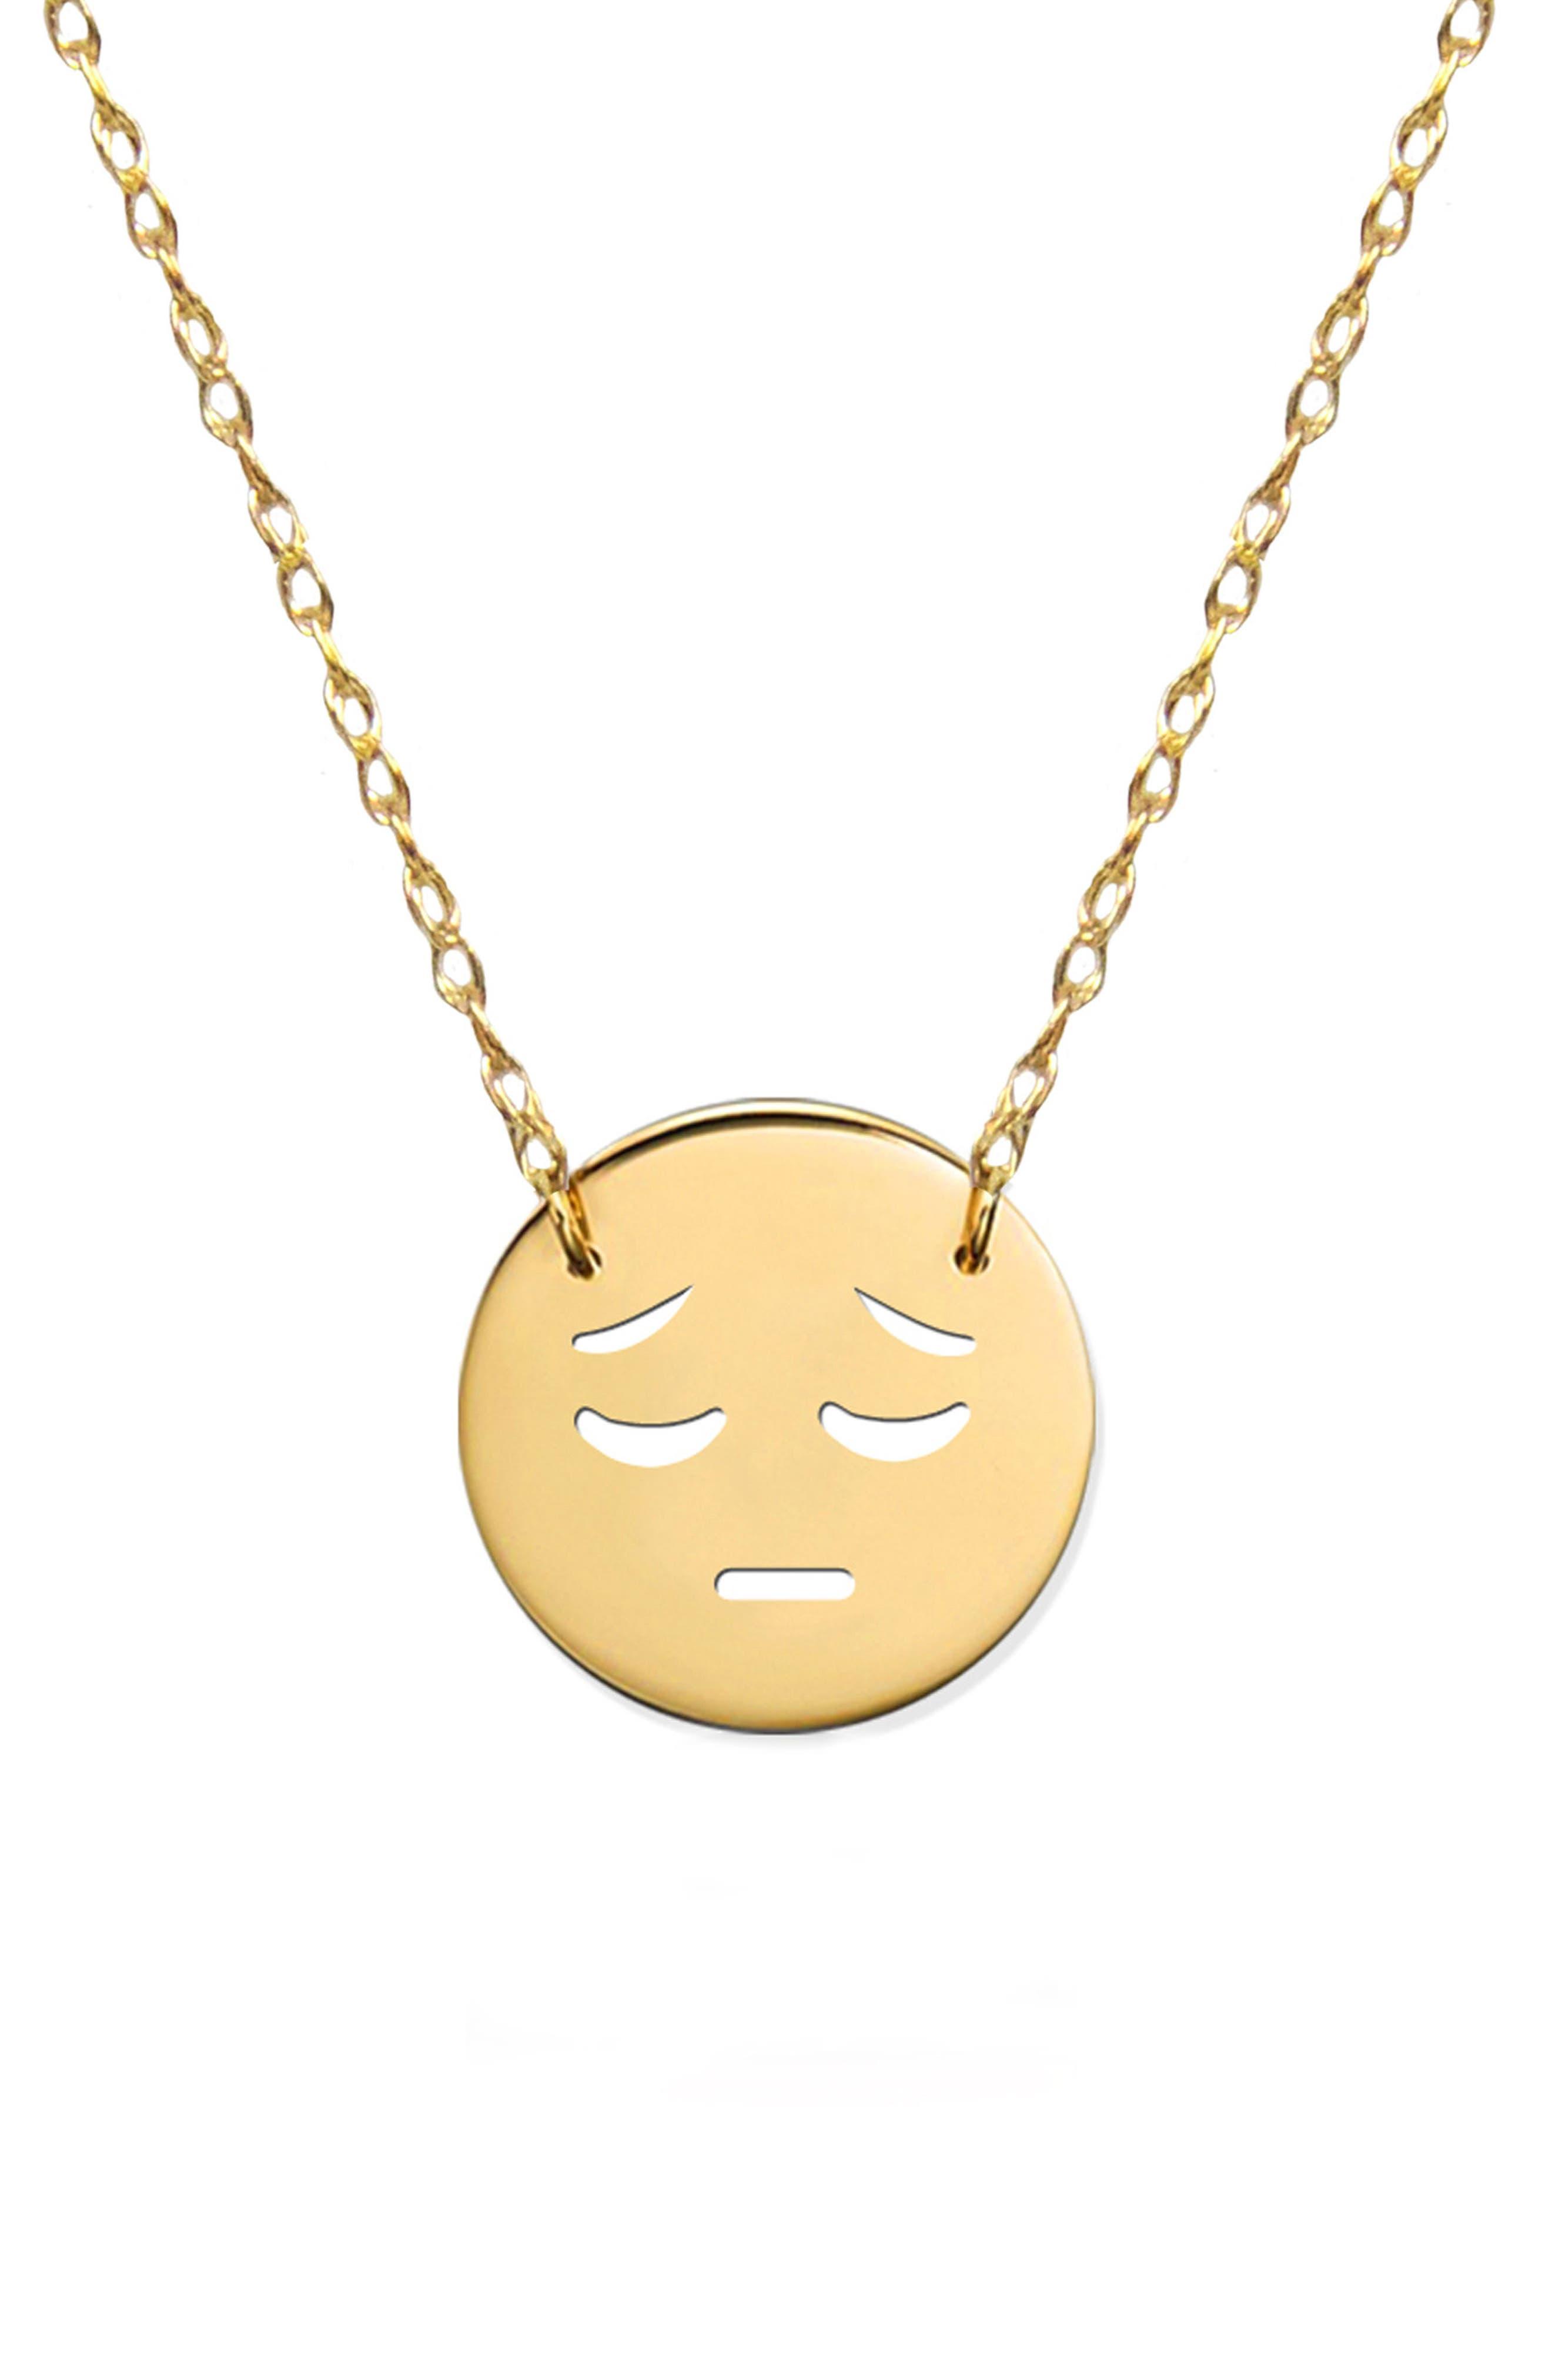 Main Image - Jane Basch Designs Sad Emoji Pendant Necklace (Nordstrom Exclusive)